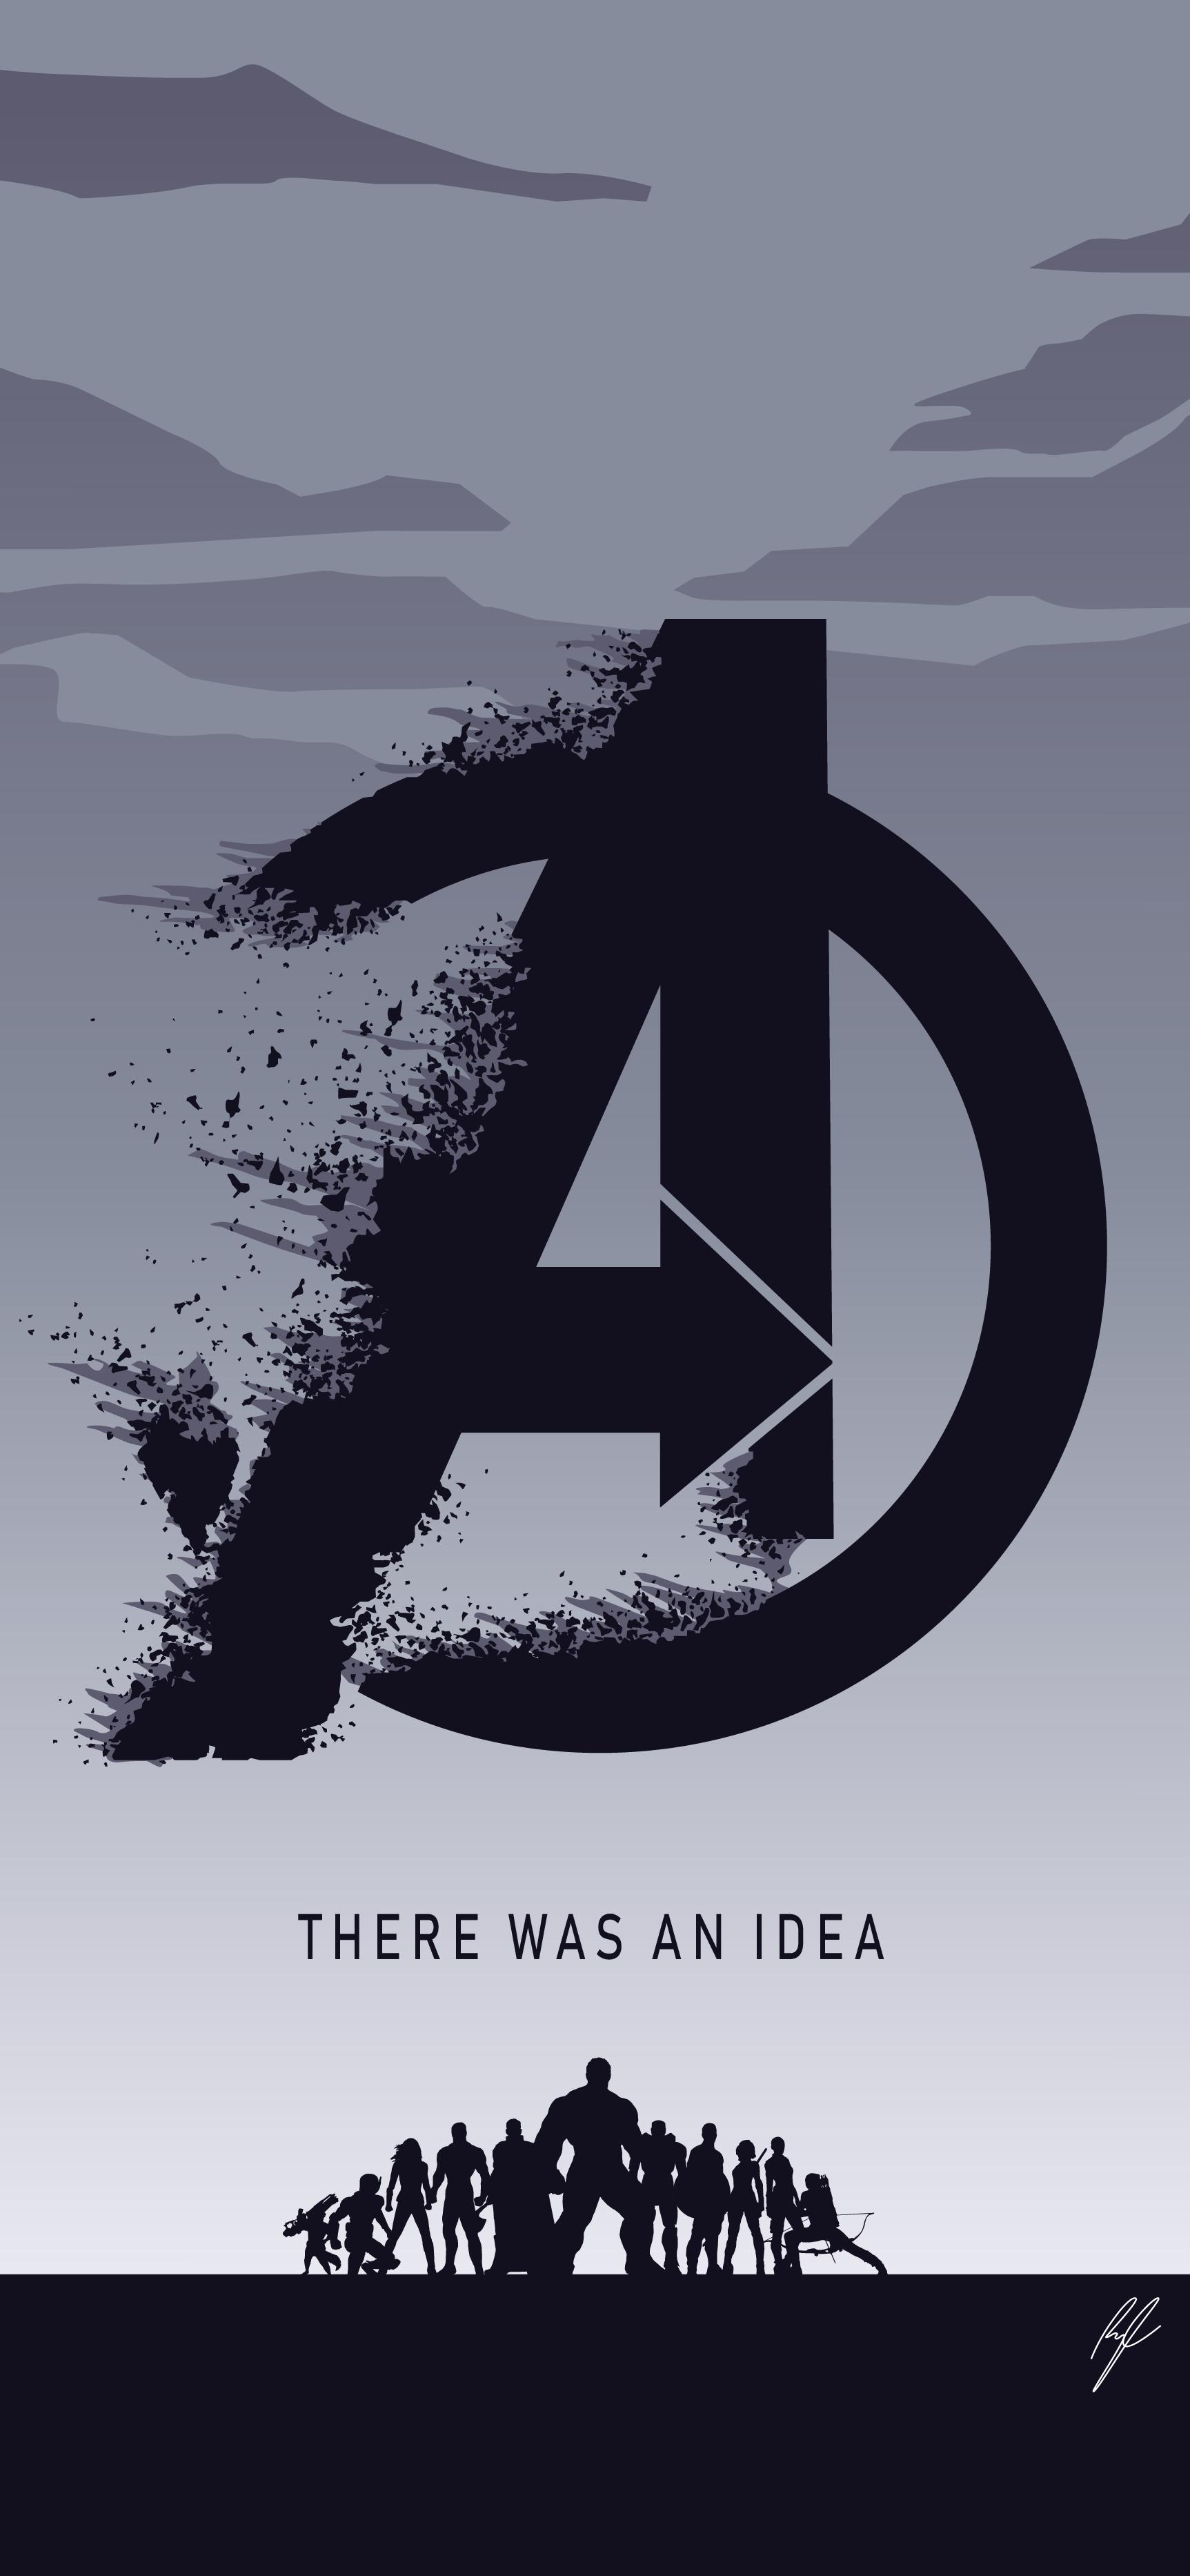 Marvel Wallpaper 4k Iphone 2966303 Hd Wallpaper Backgrounds Download